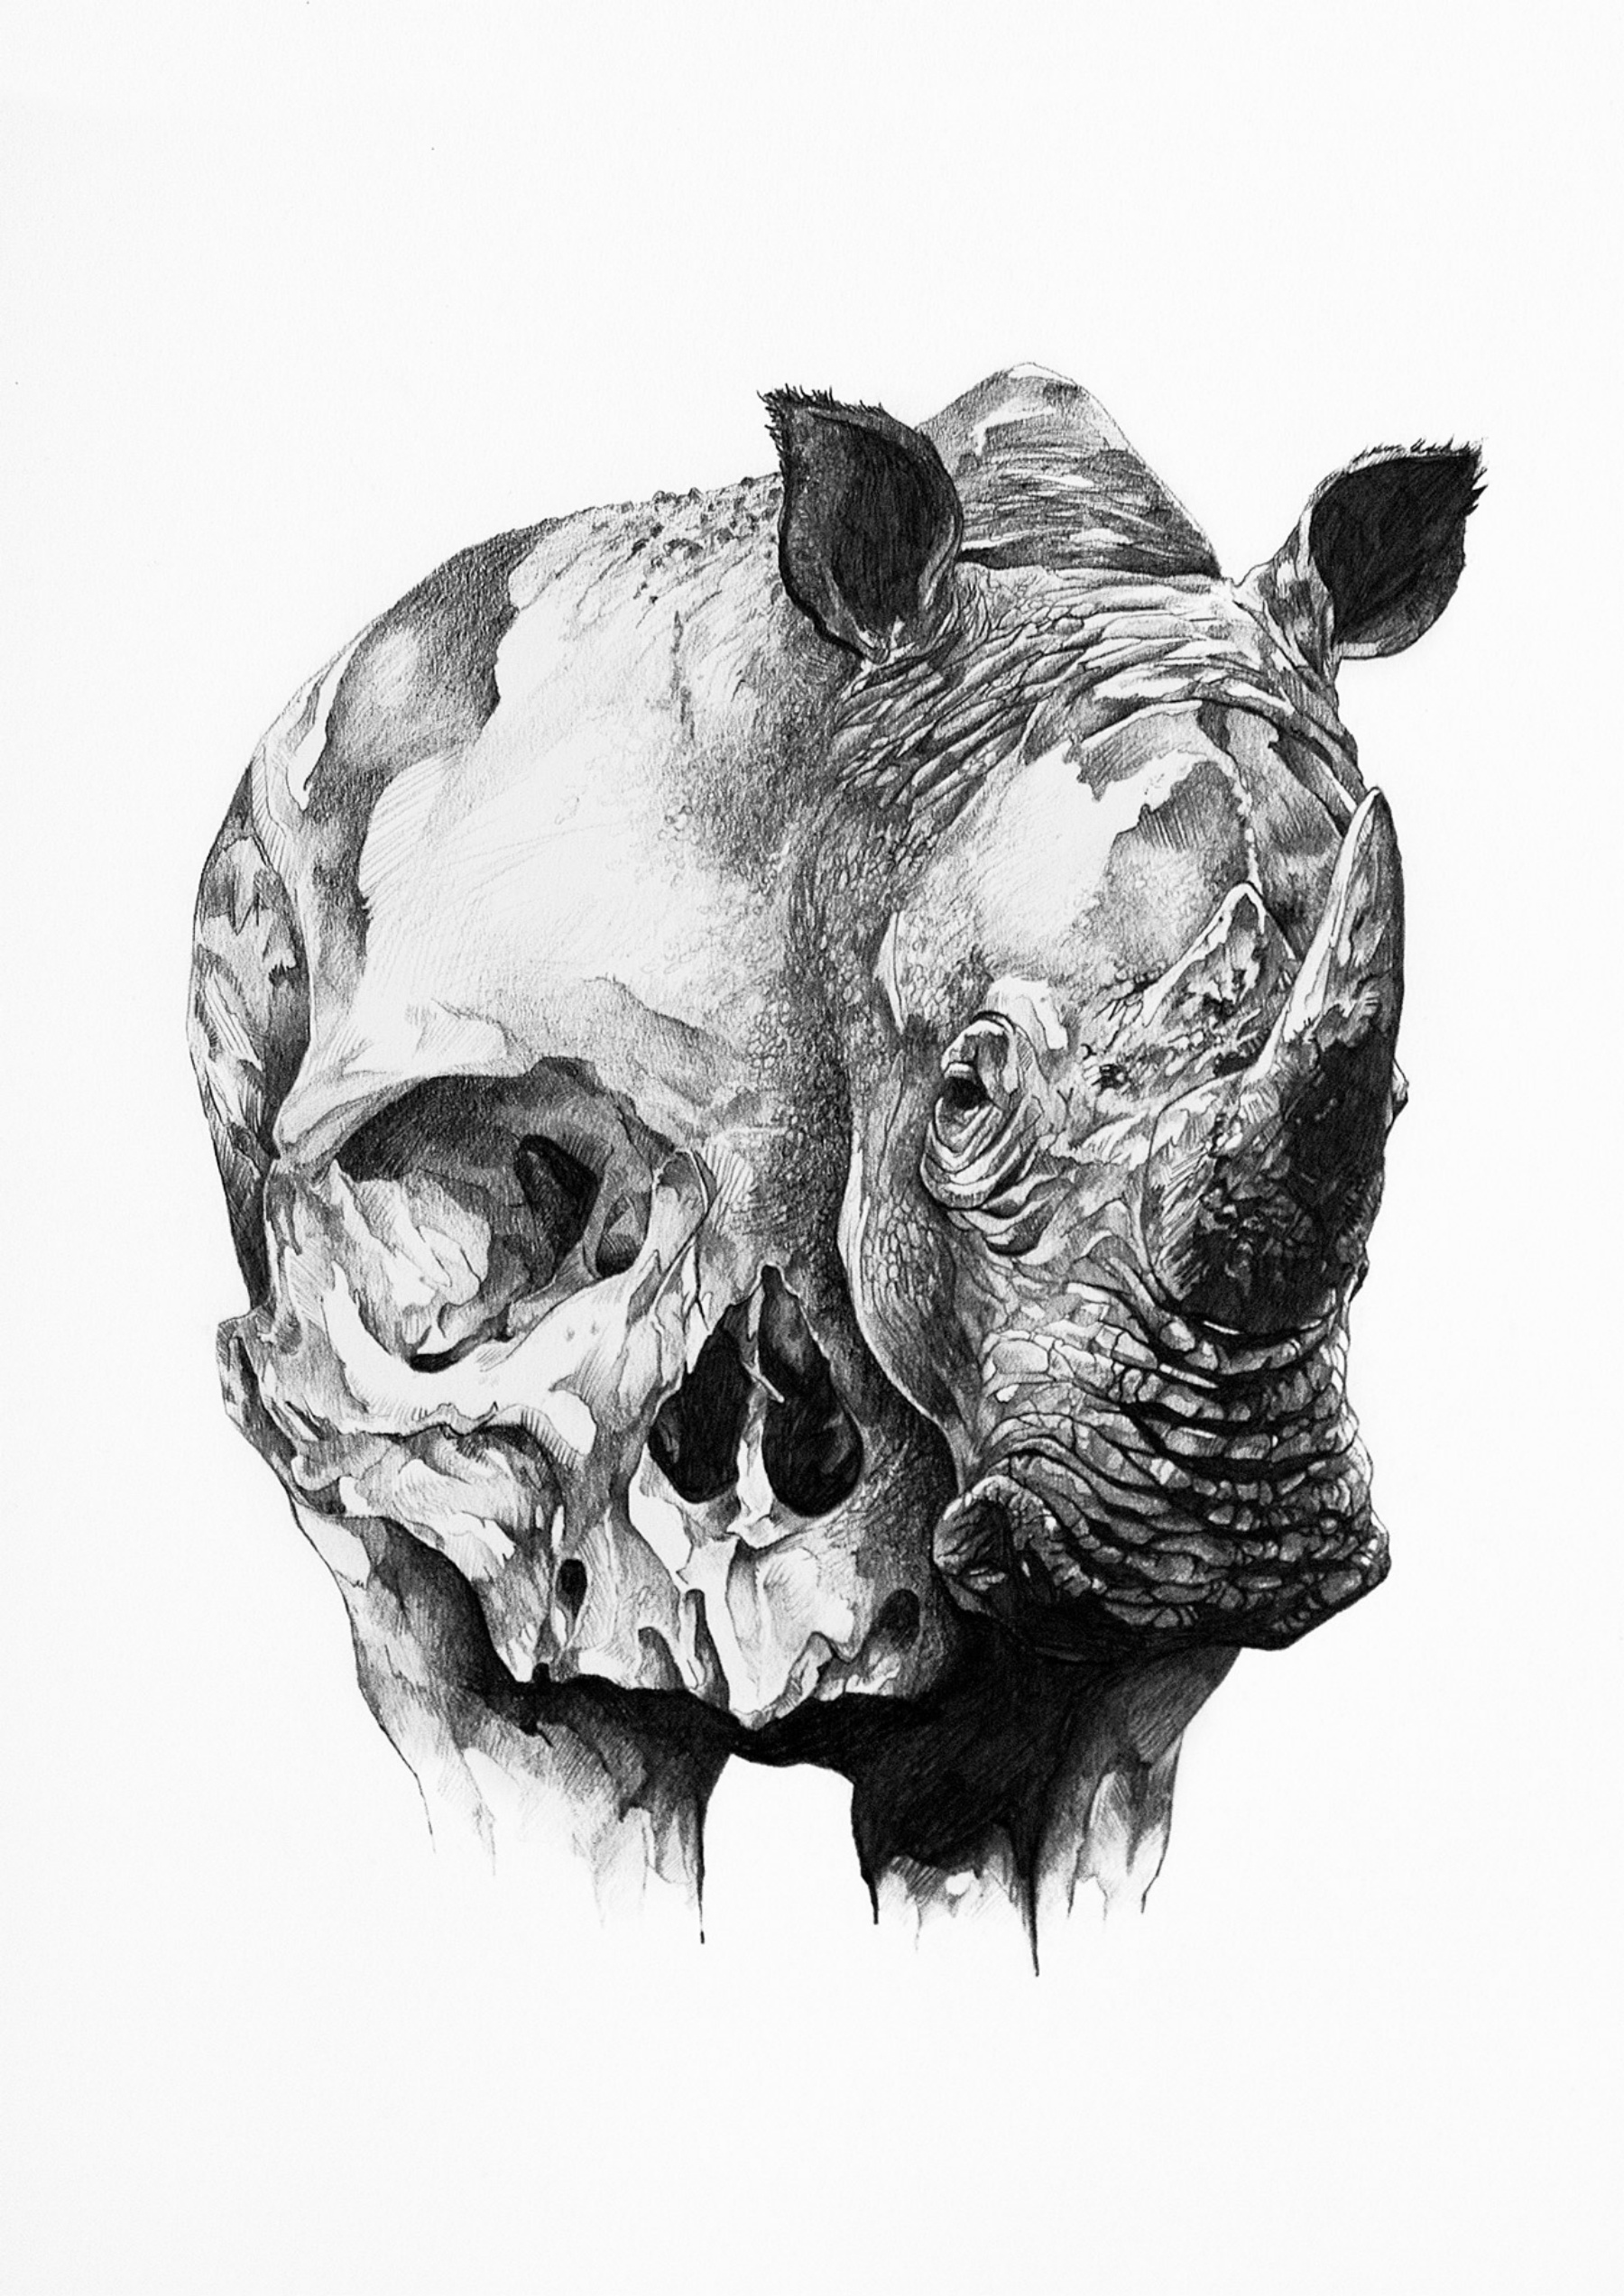 The Rhino and the Skull by Ivan Kamargio